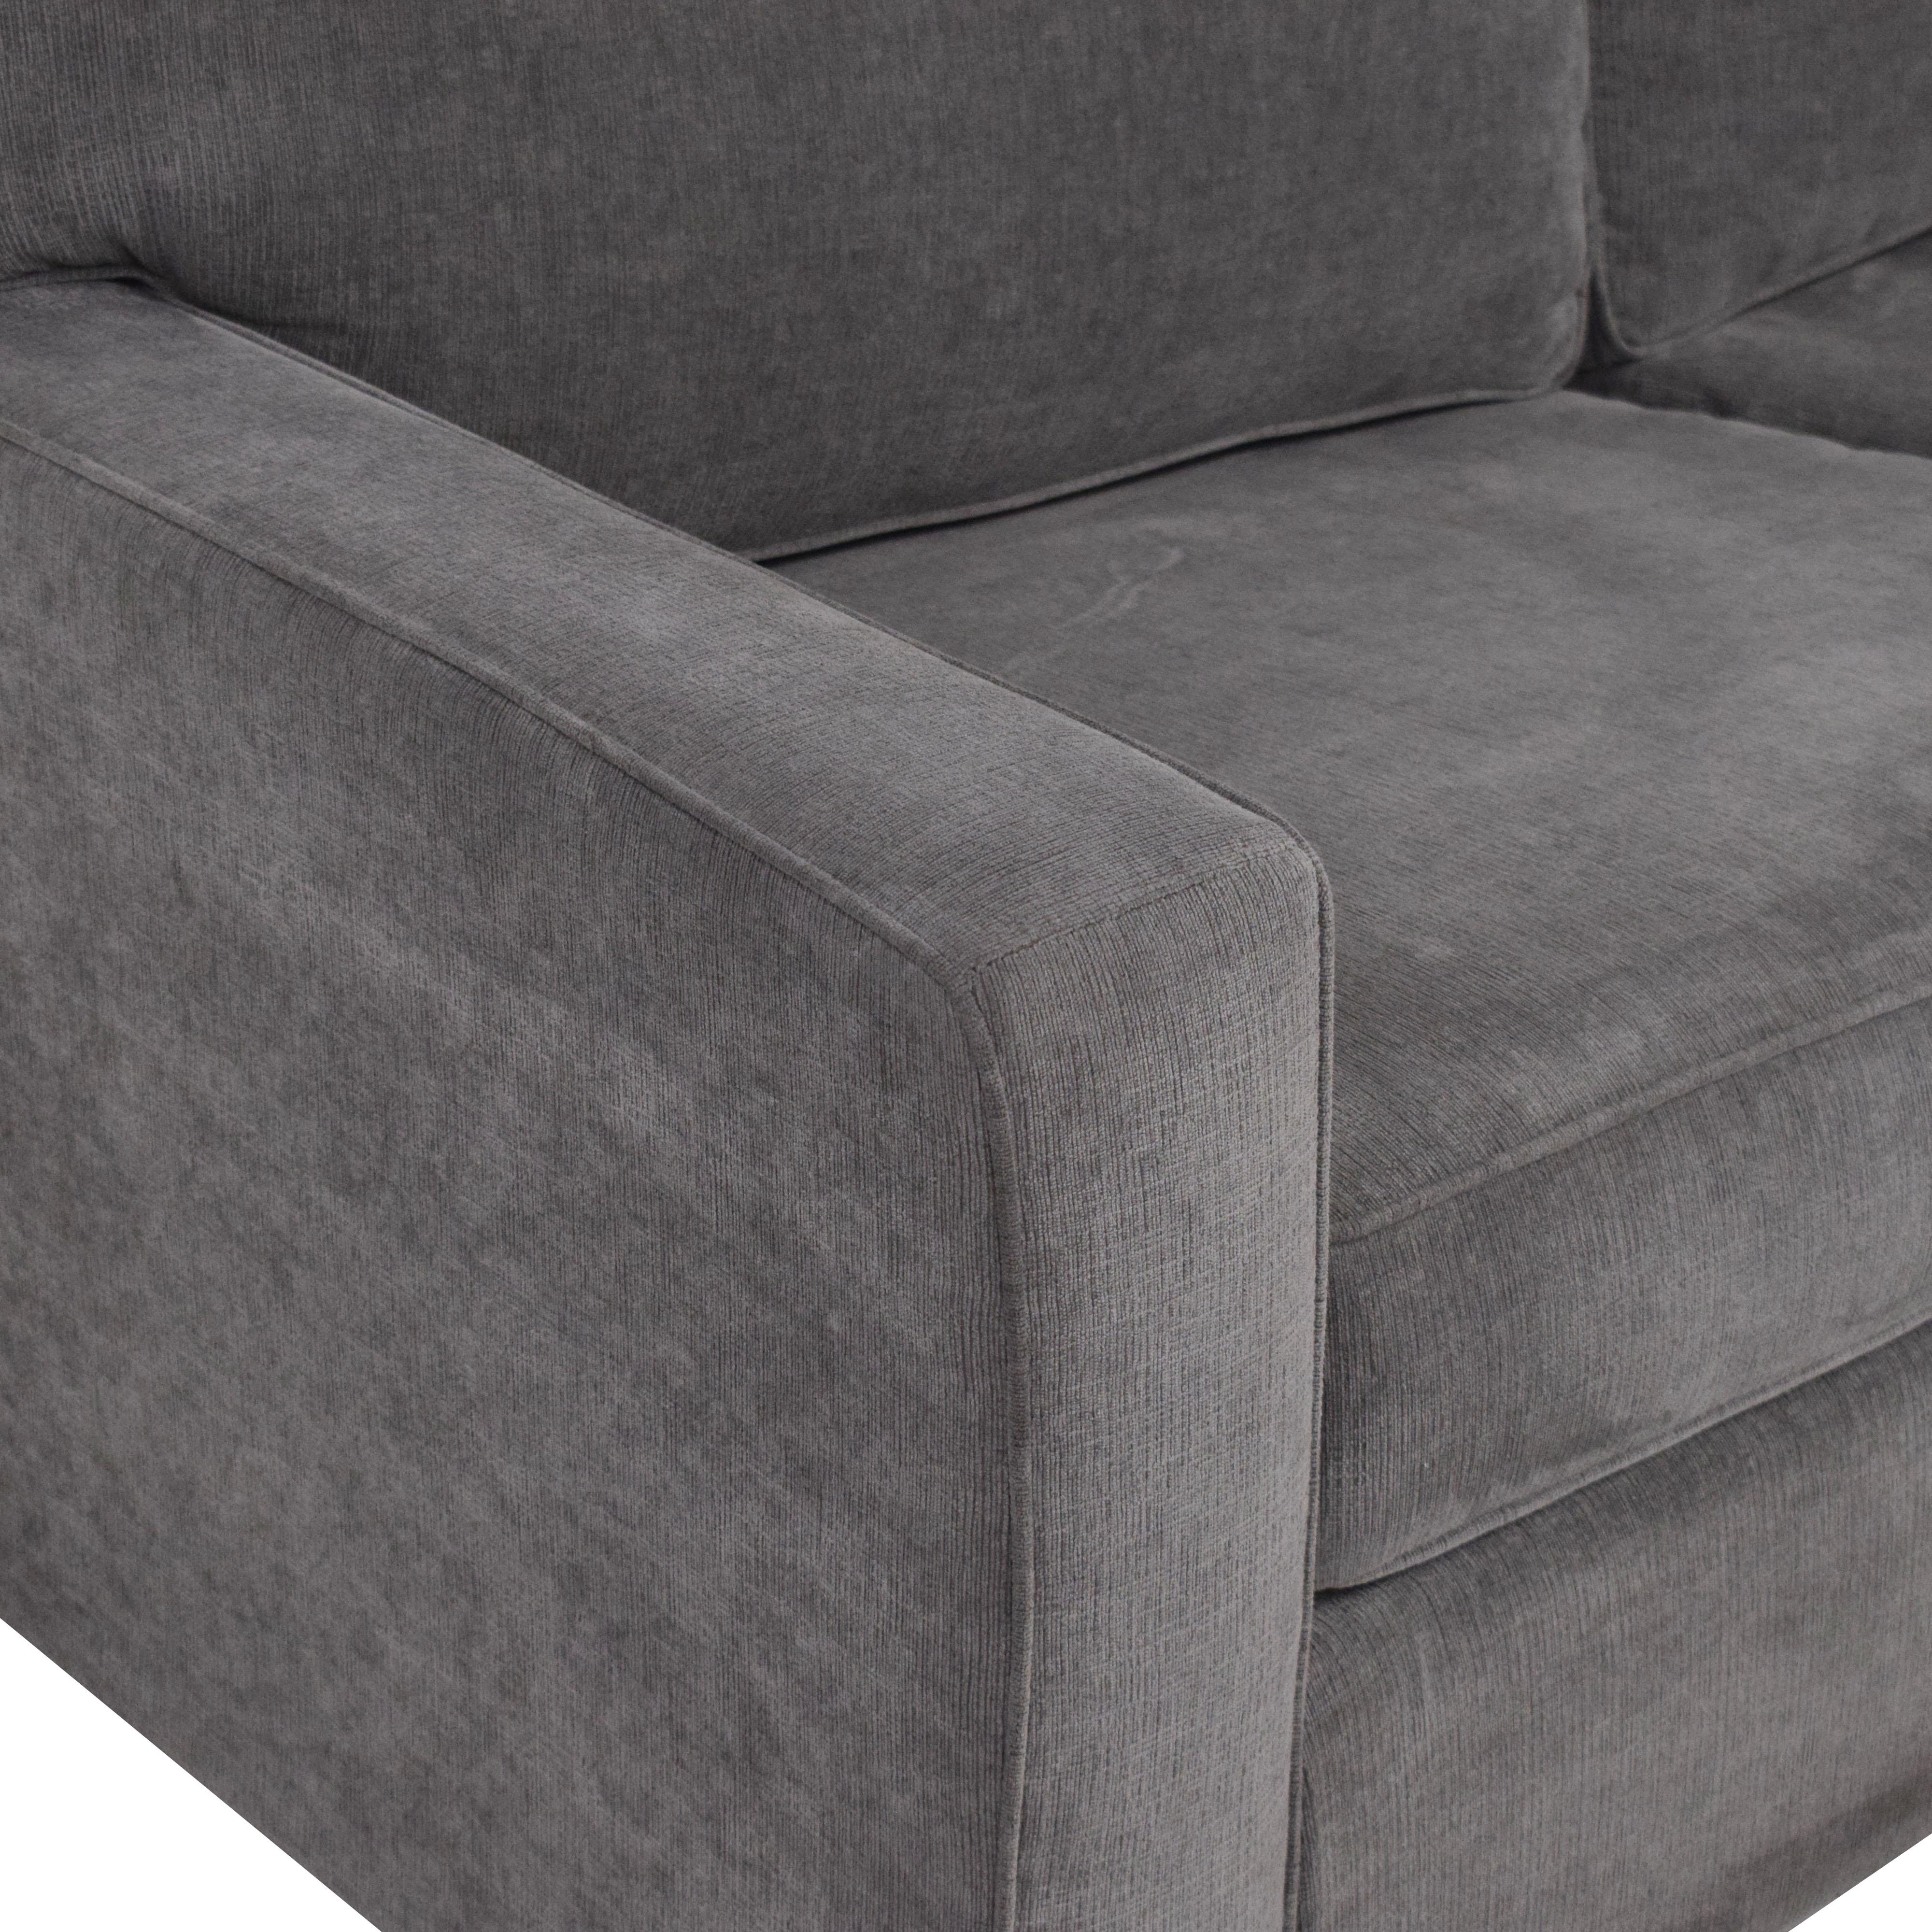 Macy's Macy's Radley Full Sleeper Sofa Bed Sofas